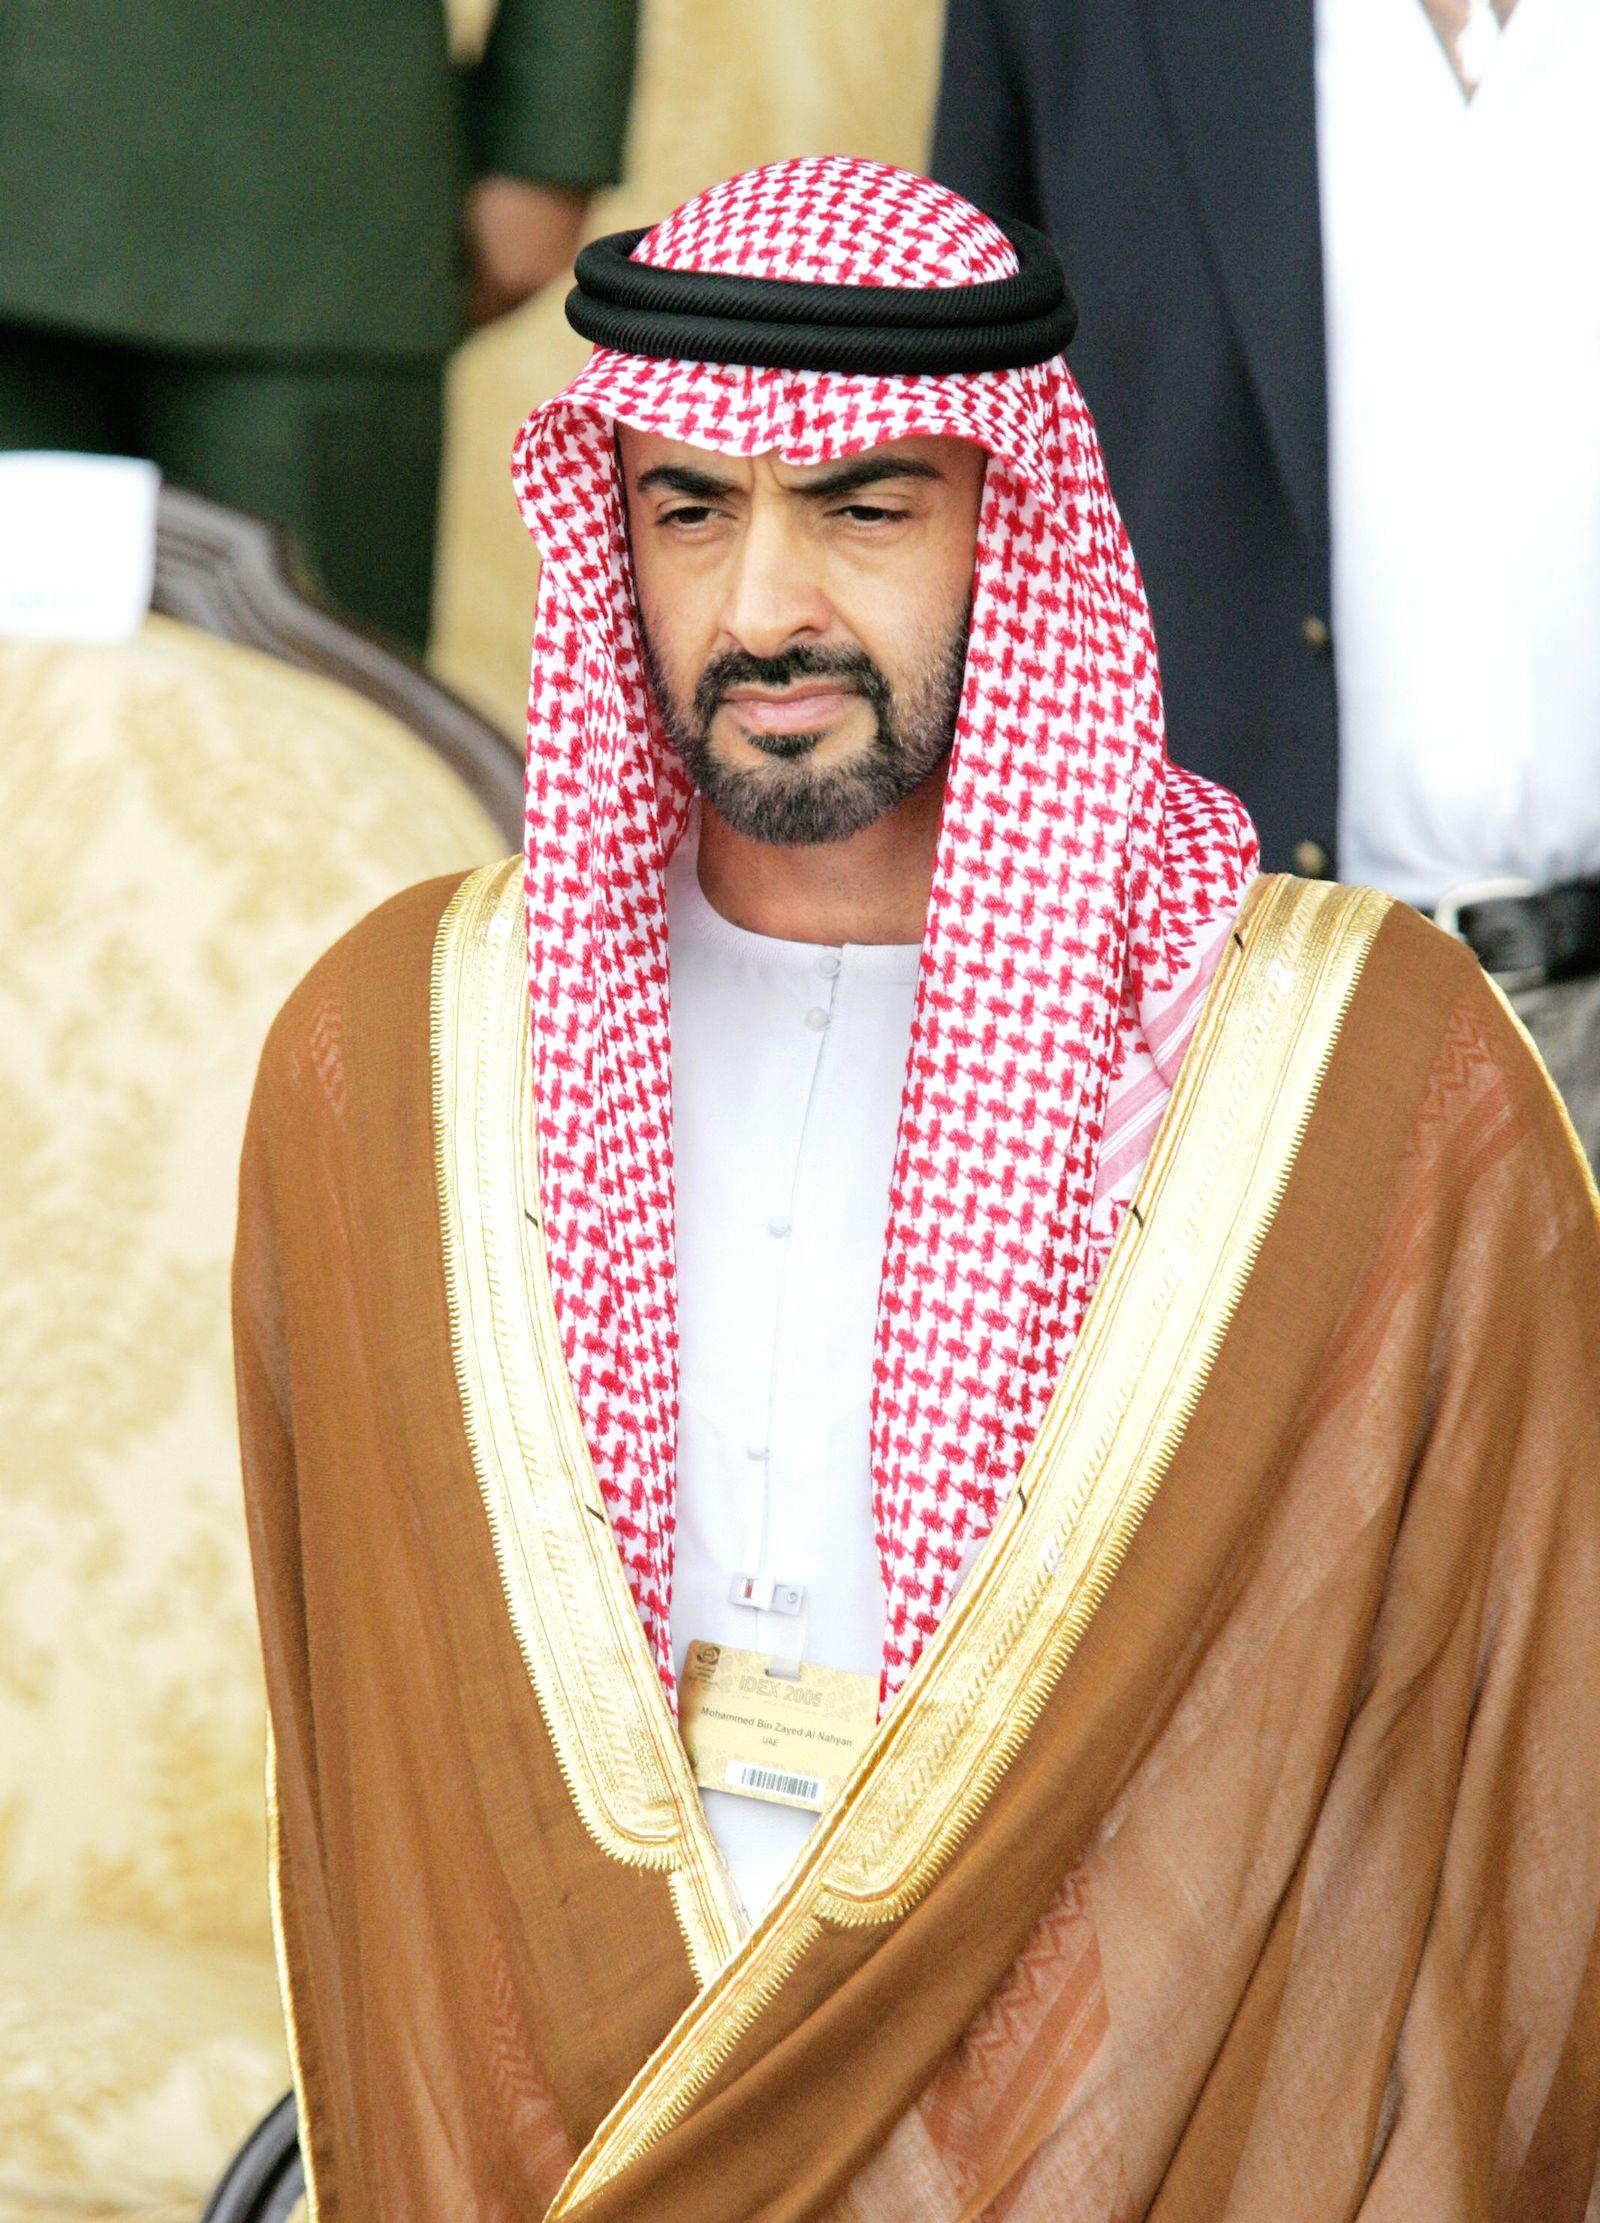 Abu-Dhabi-Kronprinz bin Zayed